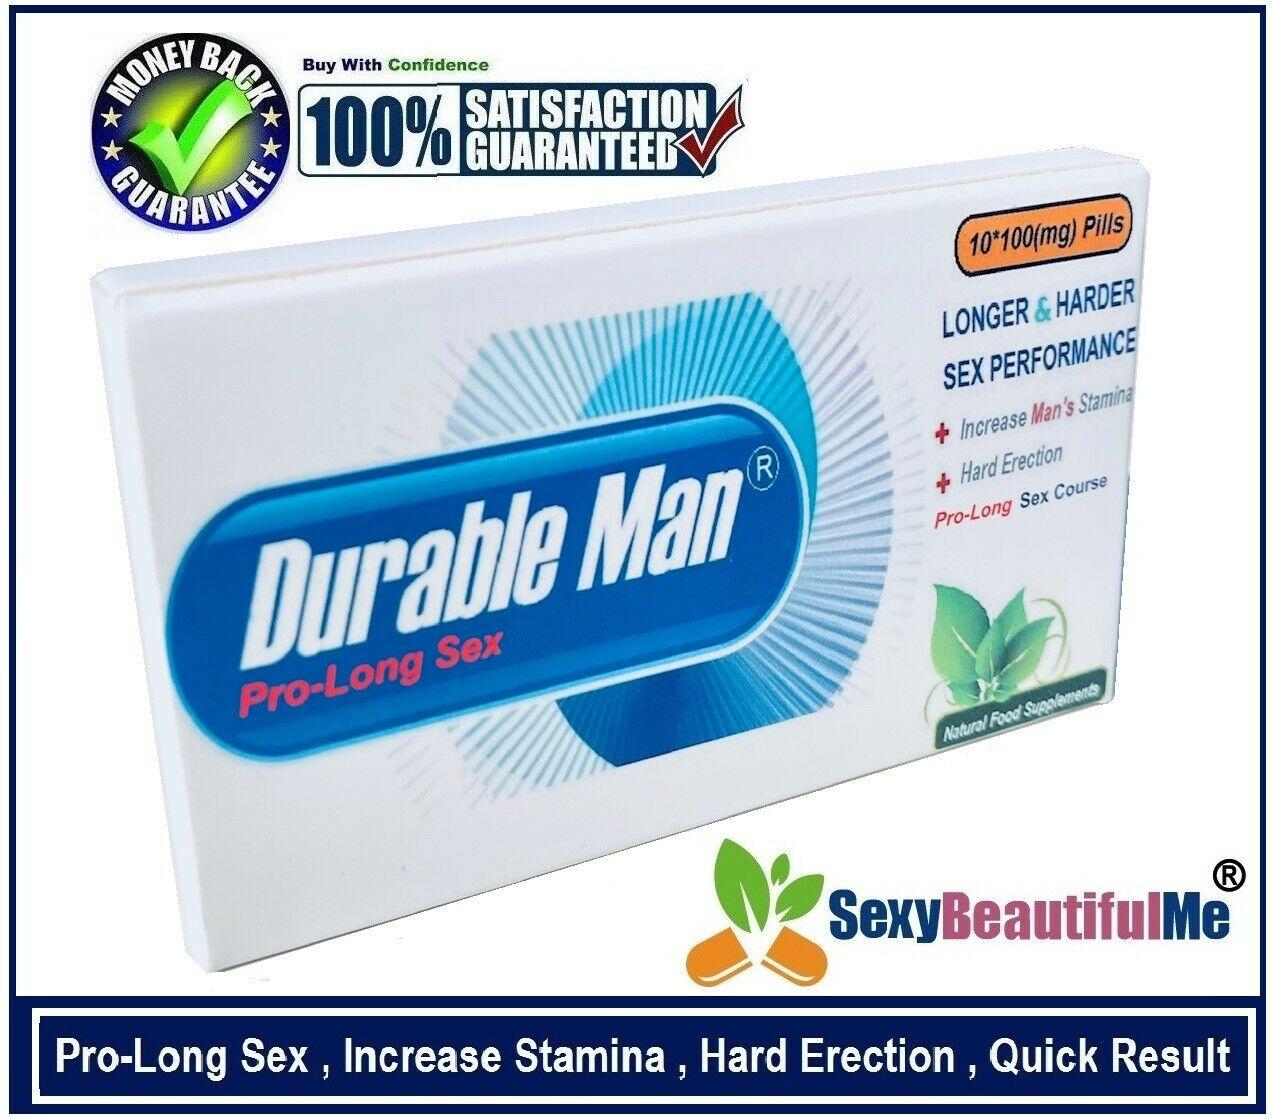 DurableMan Sex CAPS/ PILLS/TABS For Men-Very Long Lasting & Harder,Bigger-10PILL